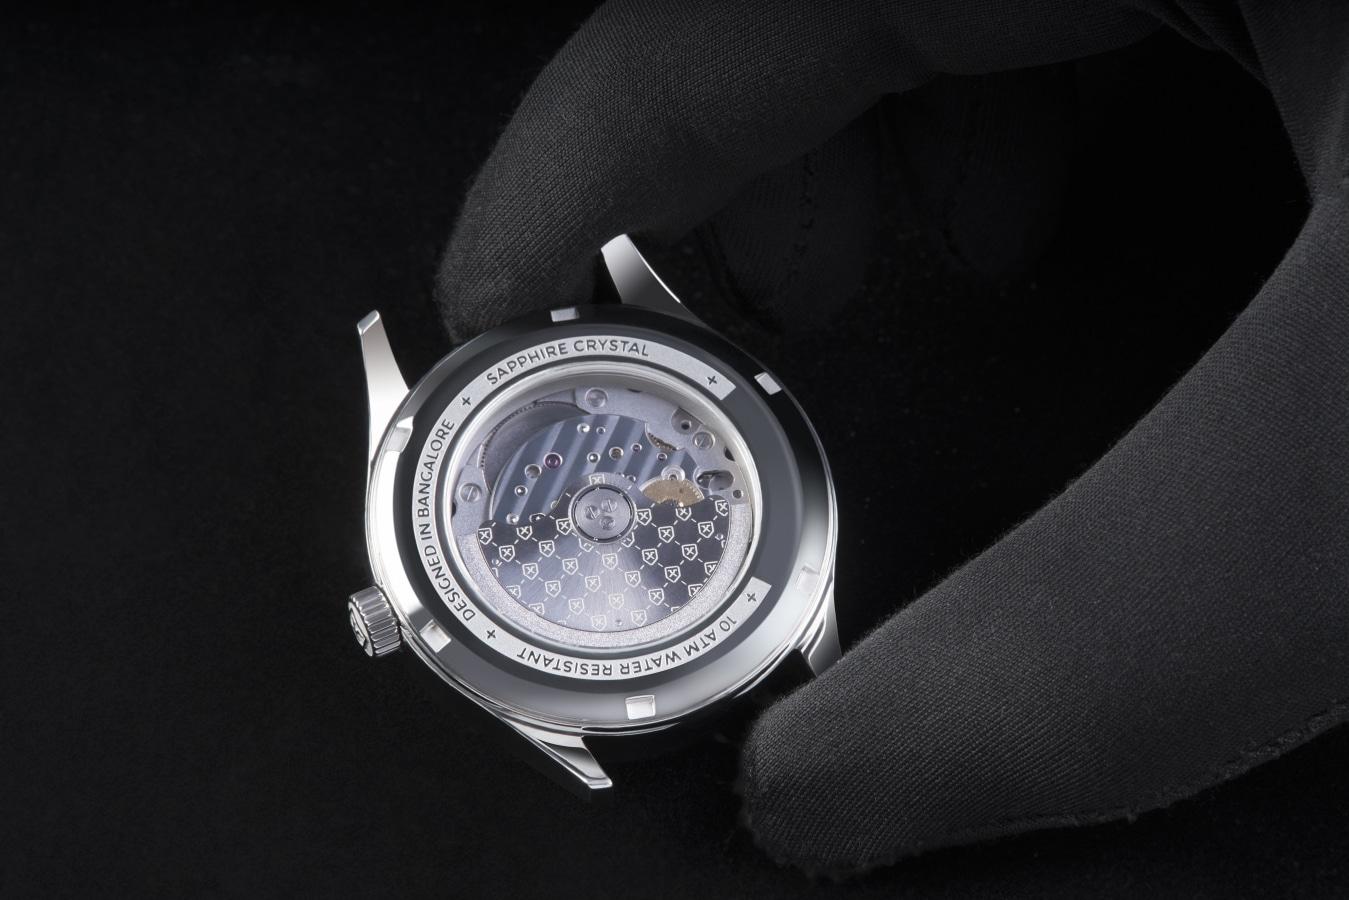 Details of Bangalore Watch Company's Renaissance collection